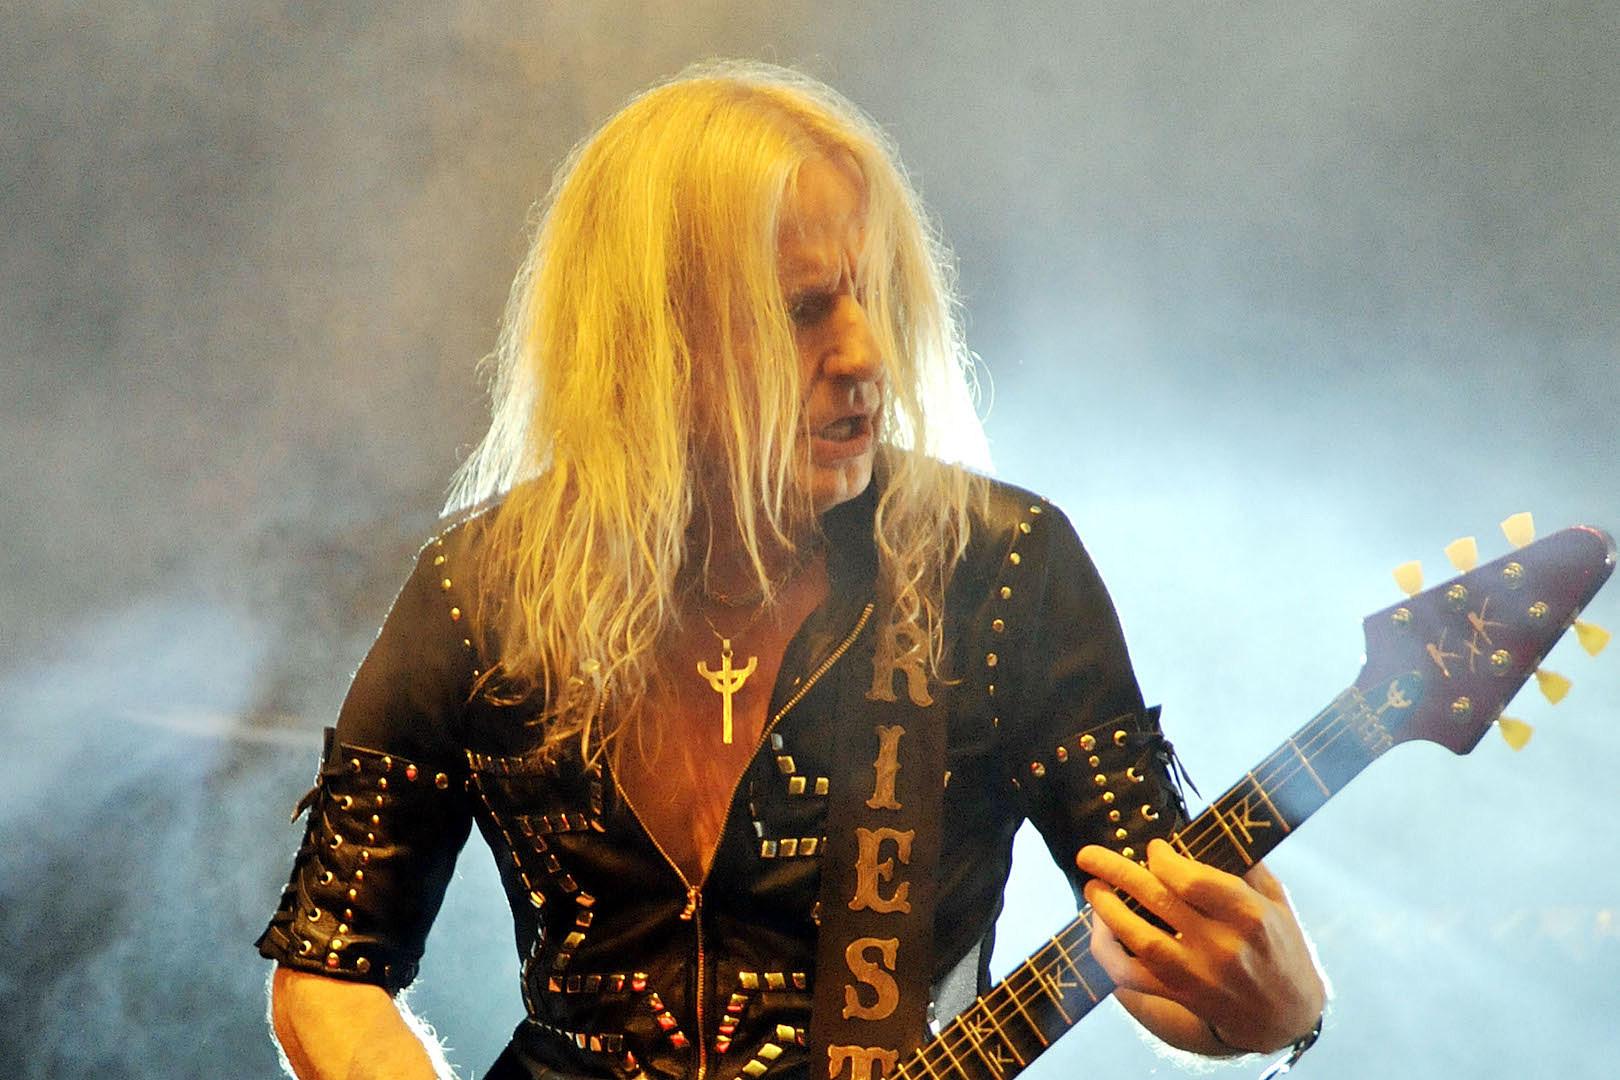 K.K. Downing Starts Band With Former Judas Priest Members, KK's Priest